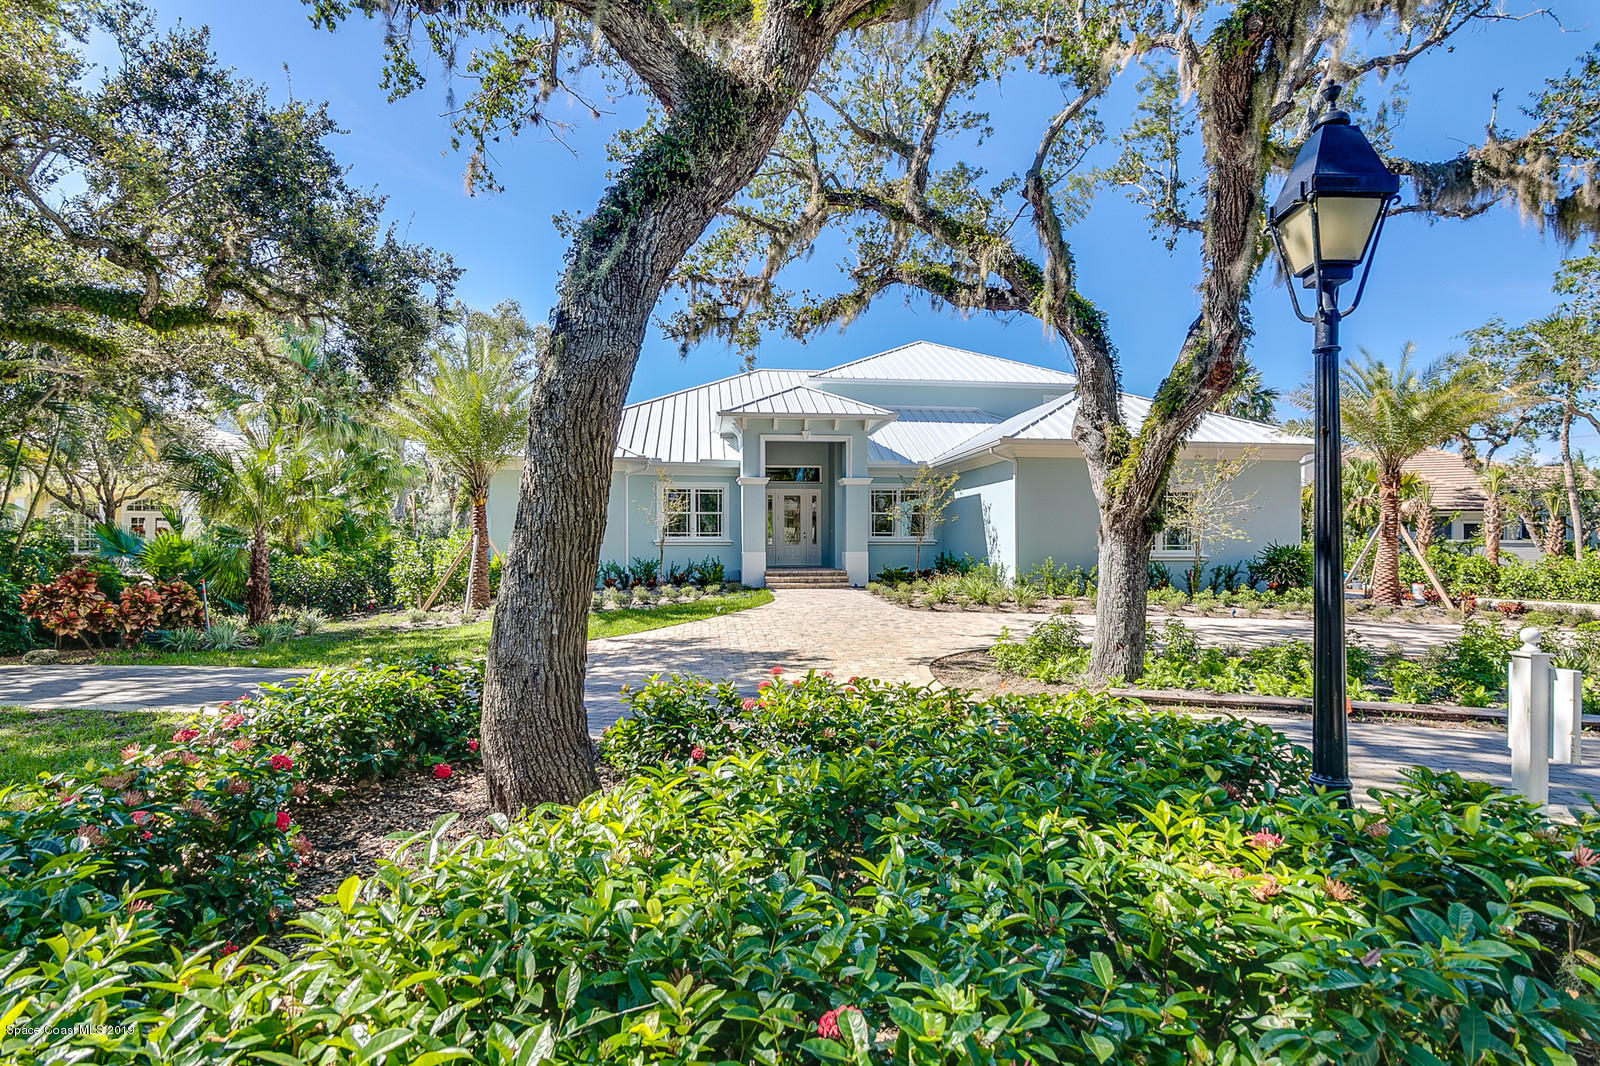 Single Family Home for Sale at 120 Island Sanctuary 120 Island Sanctuary Vero Beach, Florida 32963 United States